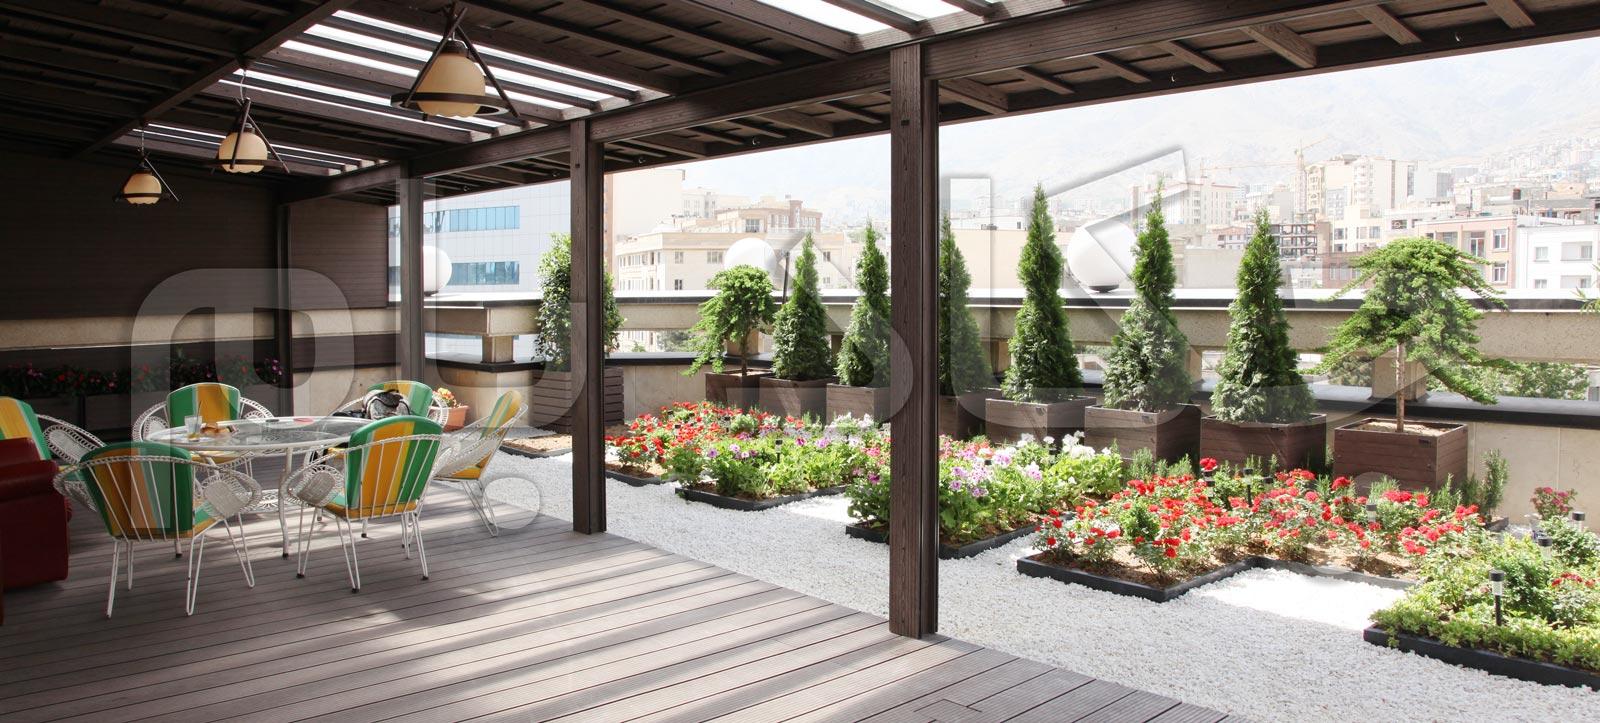 green roof garden banner iran tehran